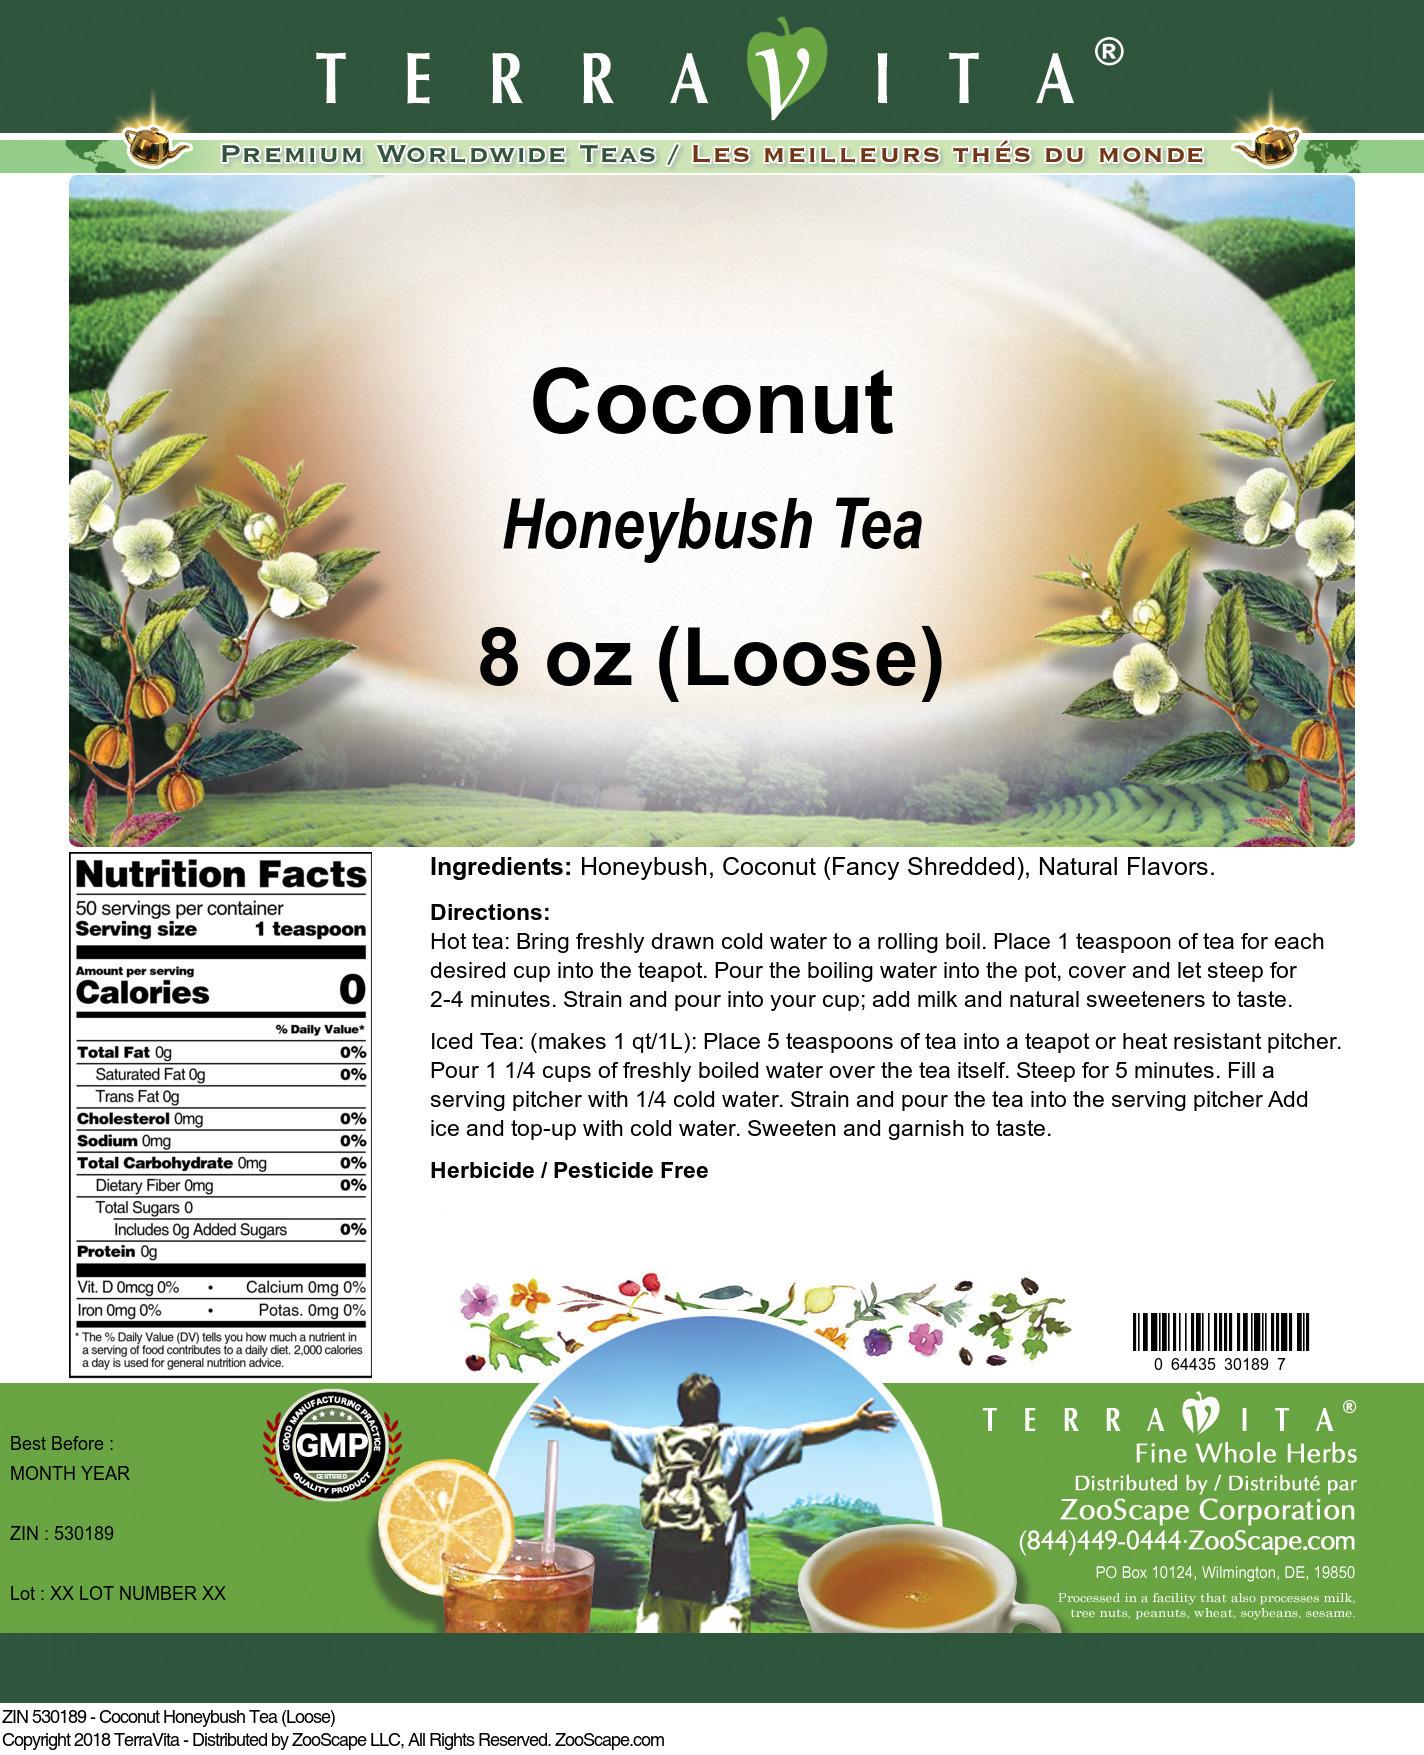 Coconut Honeybush Tea